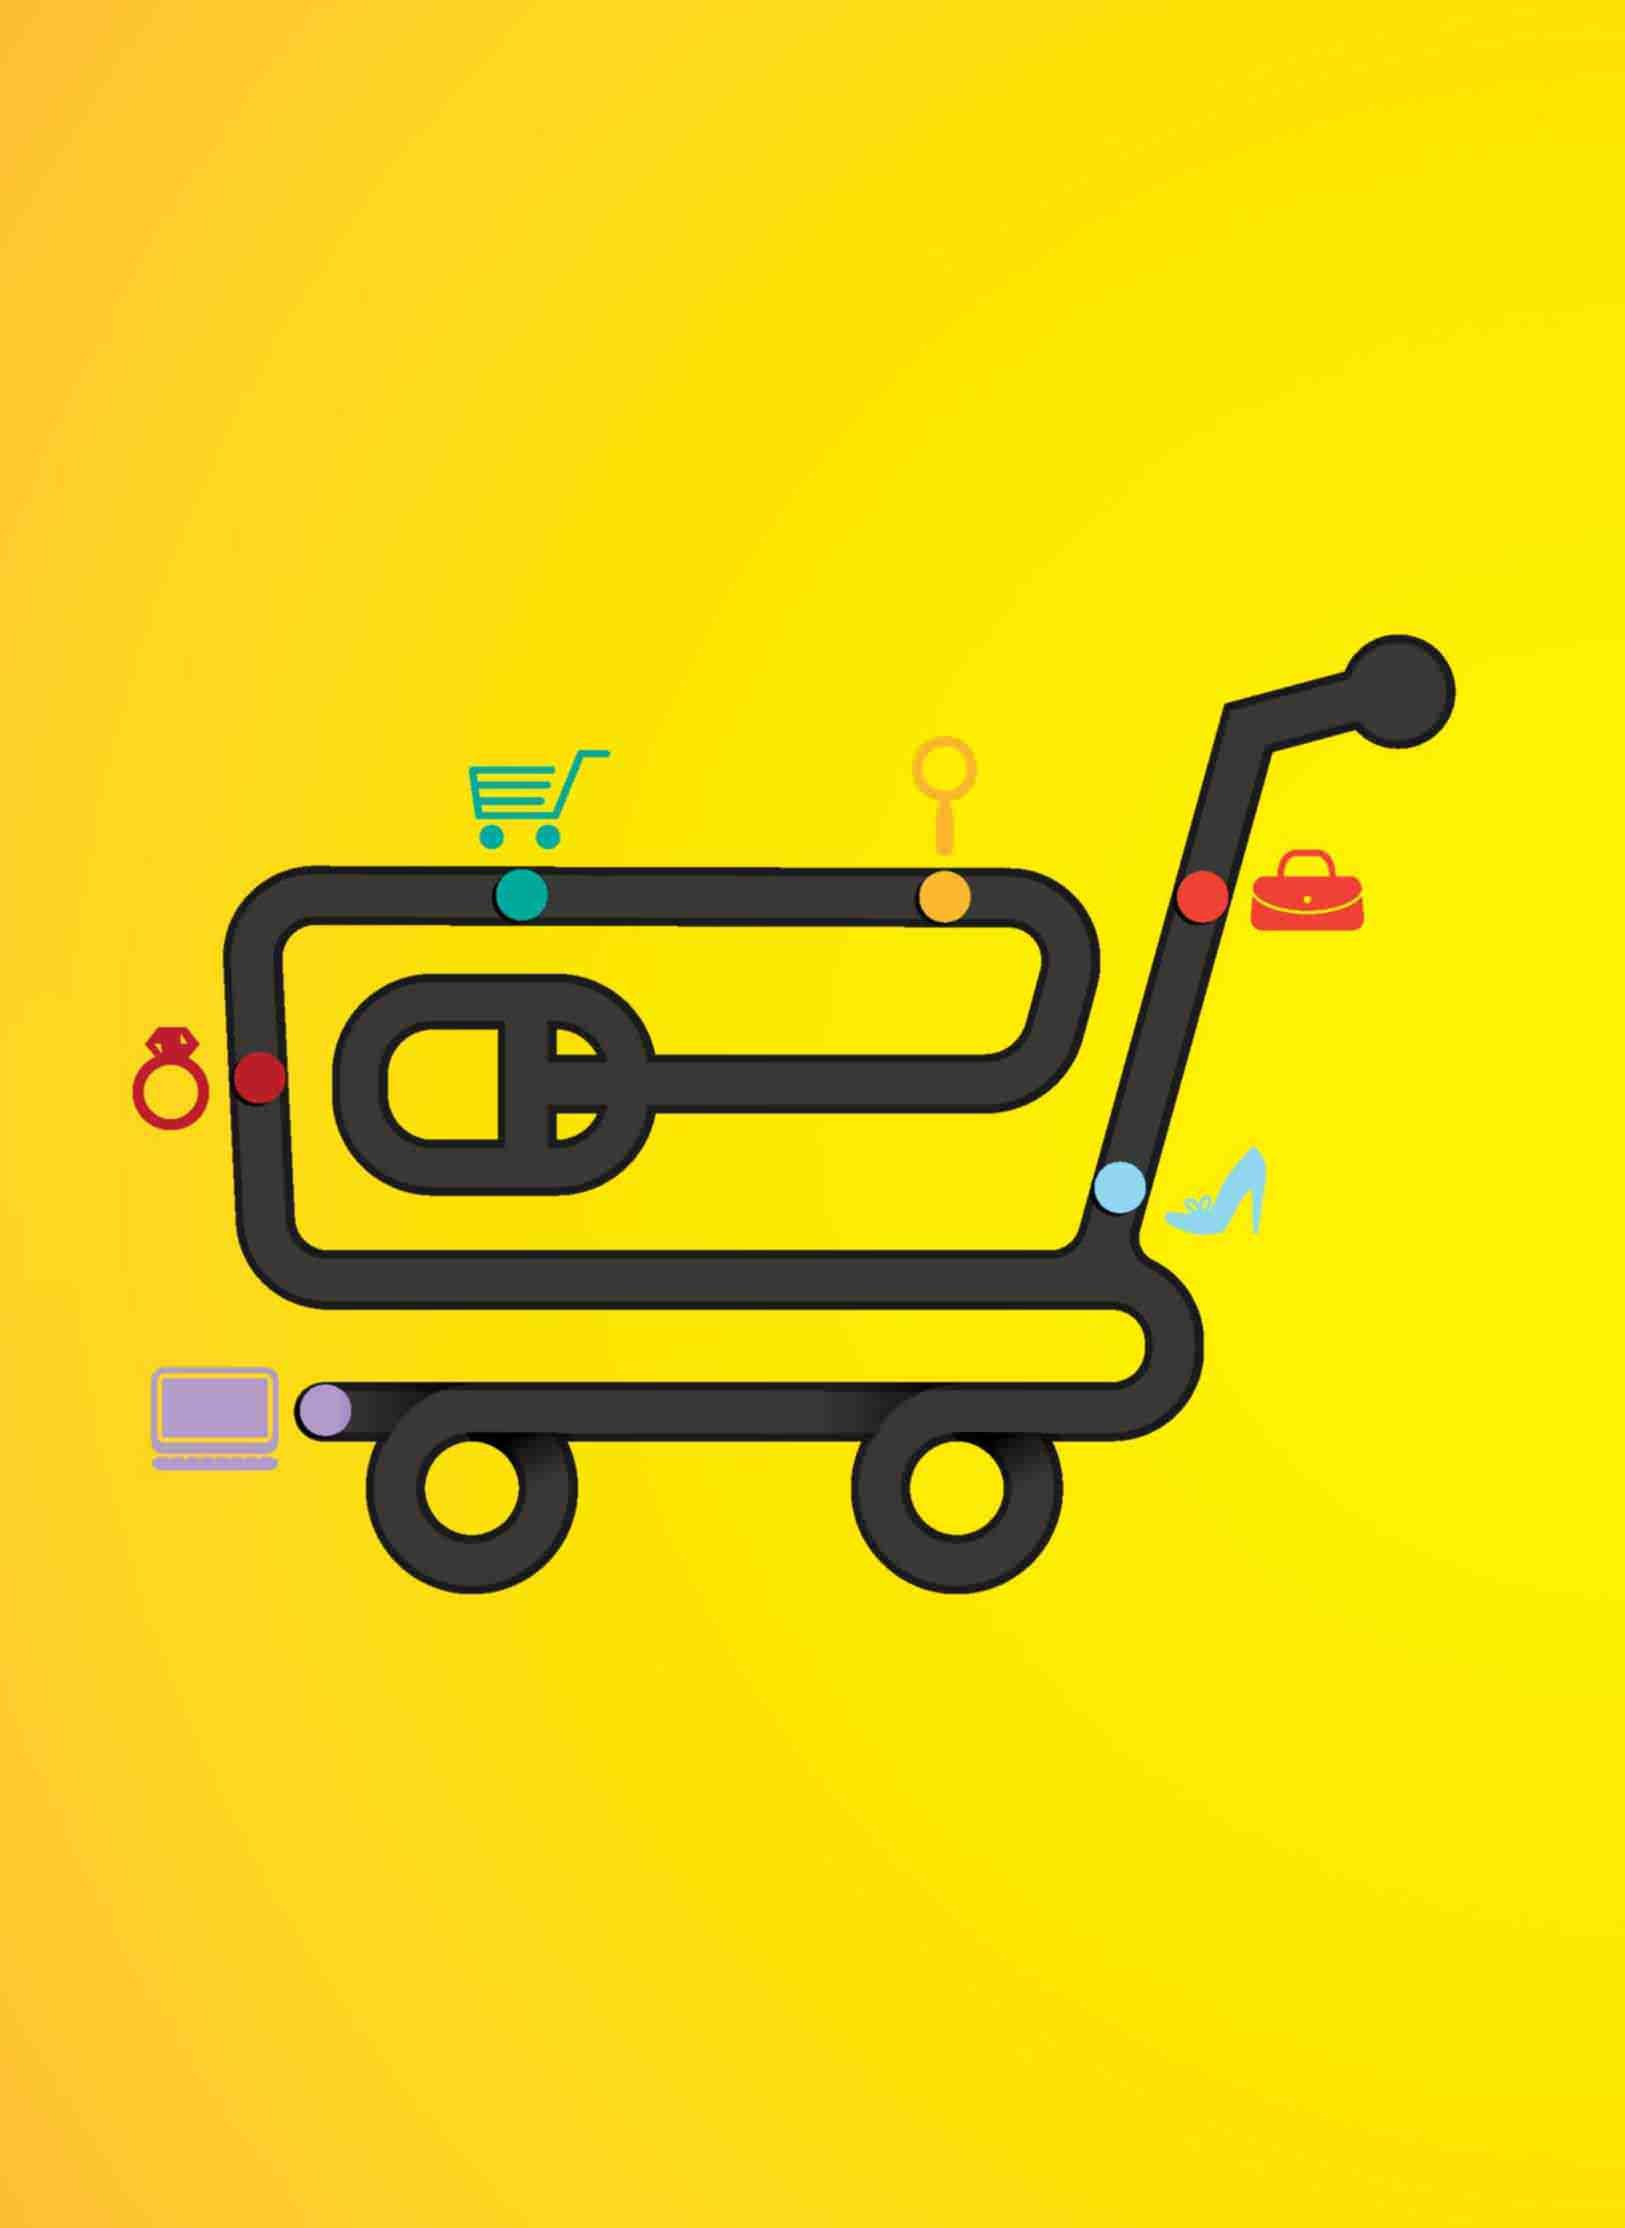 bd2fabb7ffa Flipkart Amazon Sale Online Retail Walmart